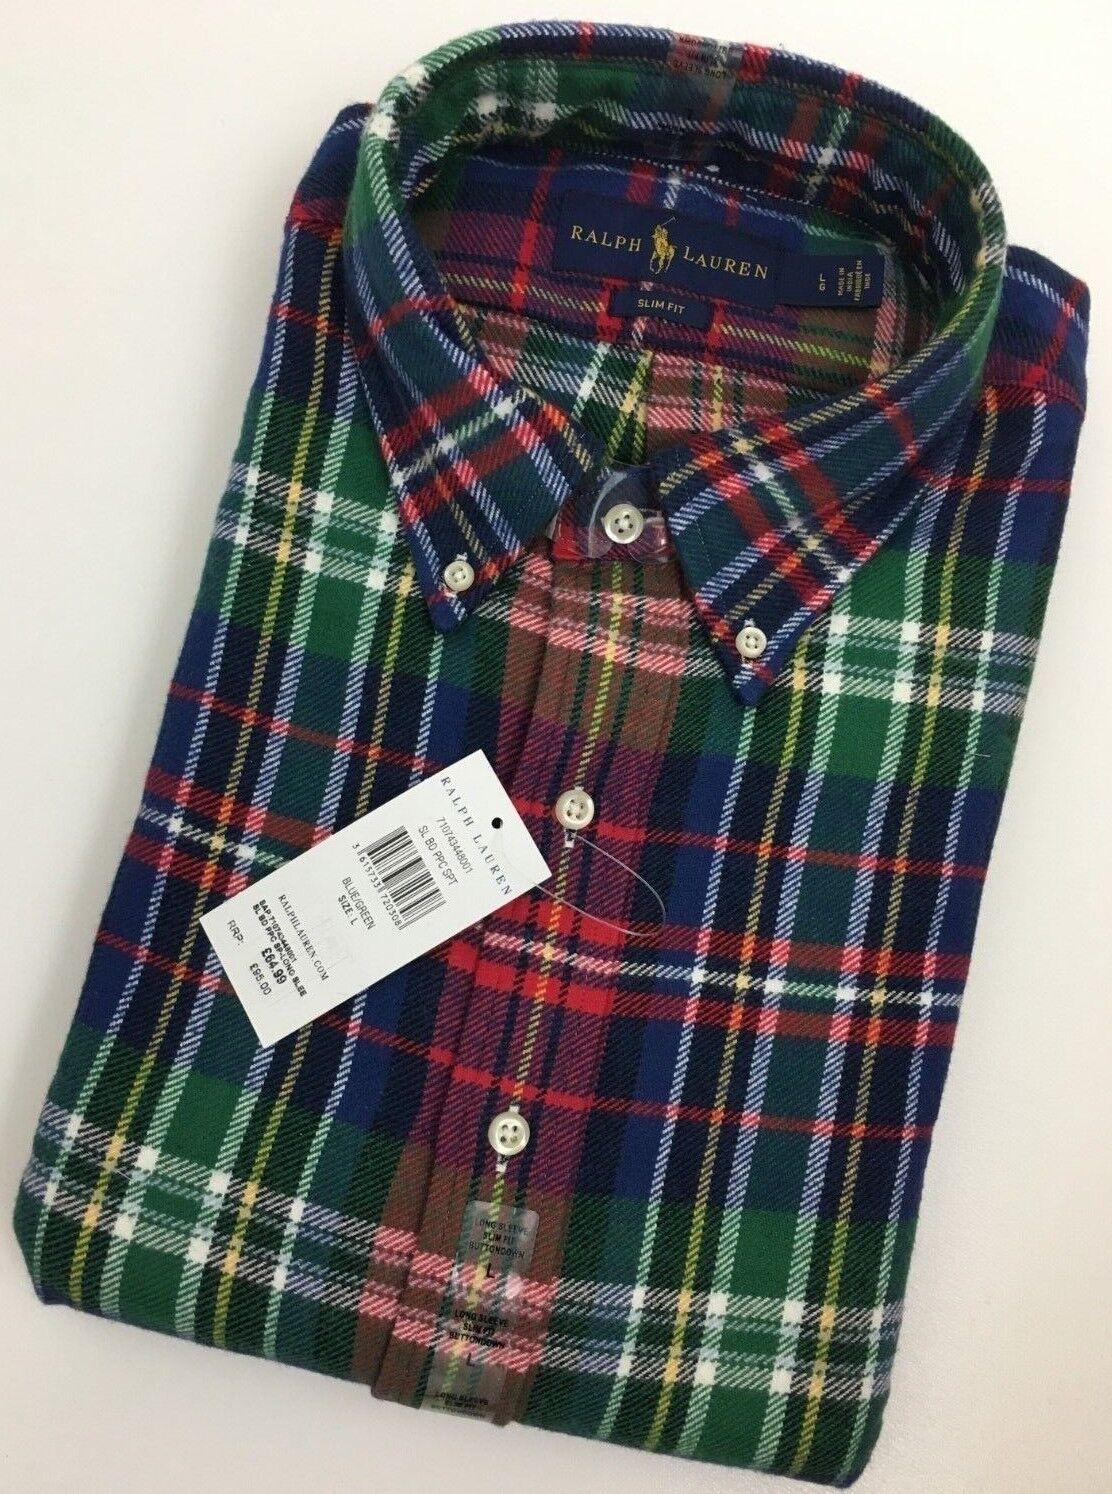 POLO Ralph Lauren cotone spazzolato BUTTON-DOWN Check Camicia PRP